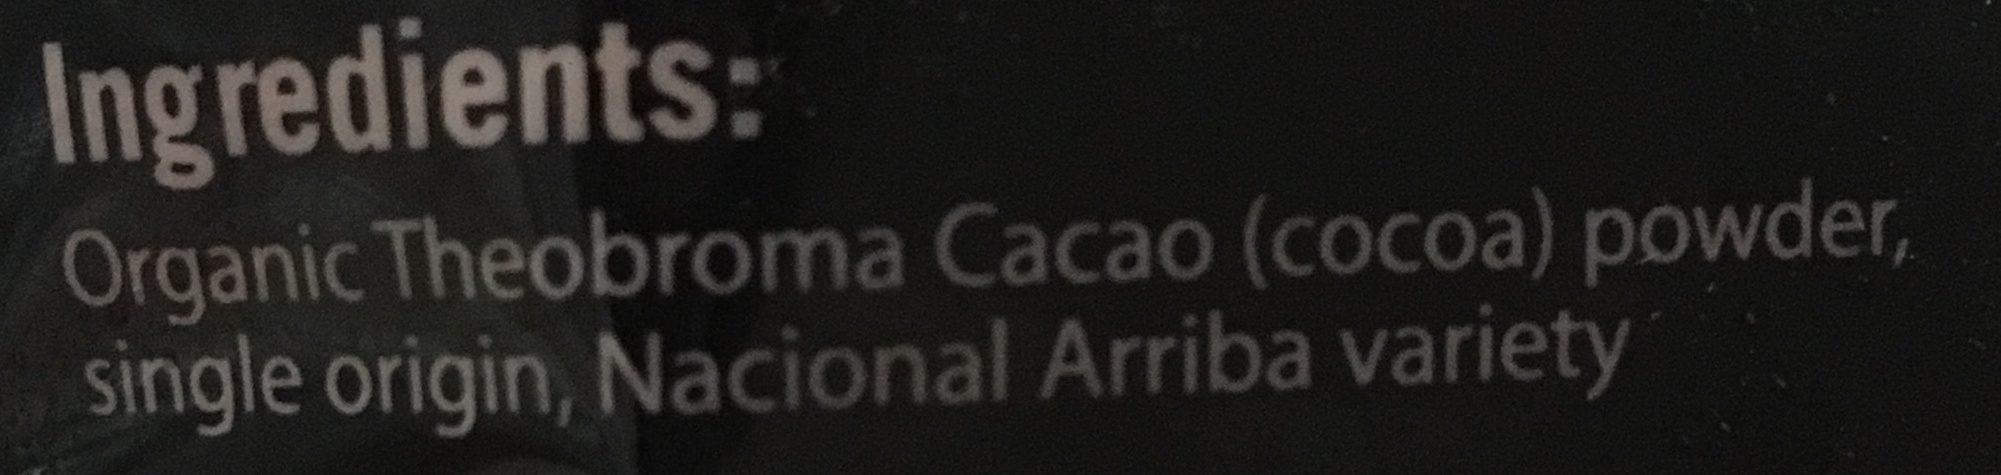 Choc chick raw cocoa powder - Ingrédients - fr